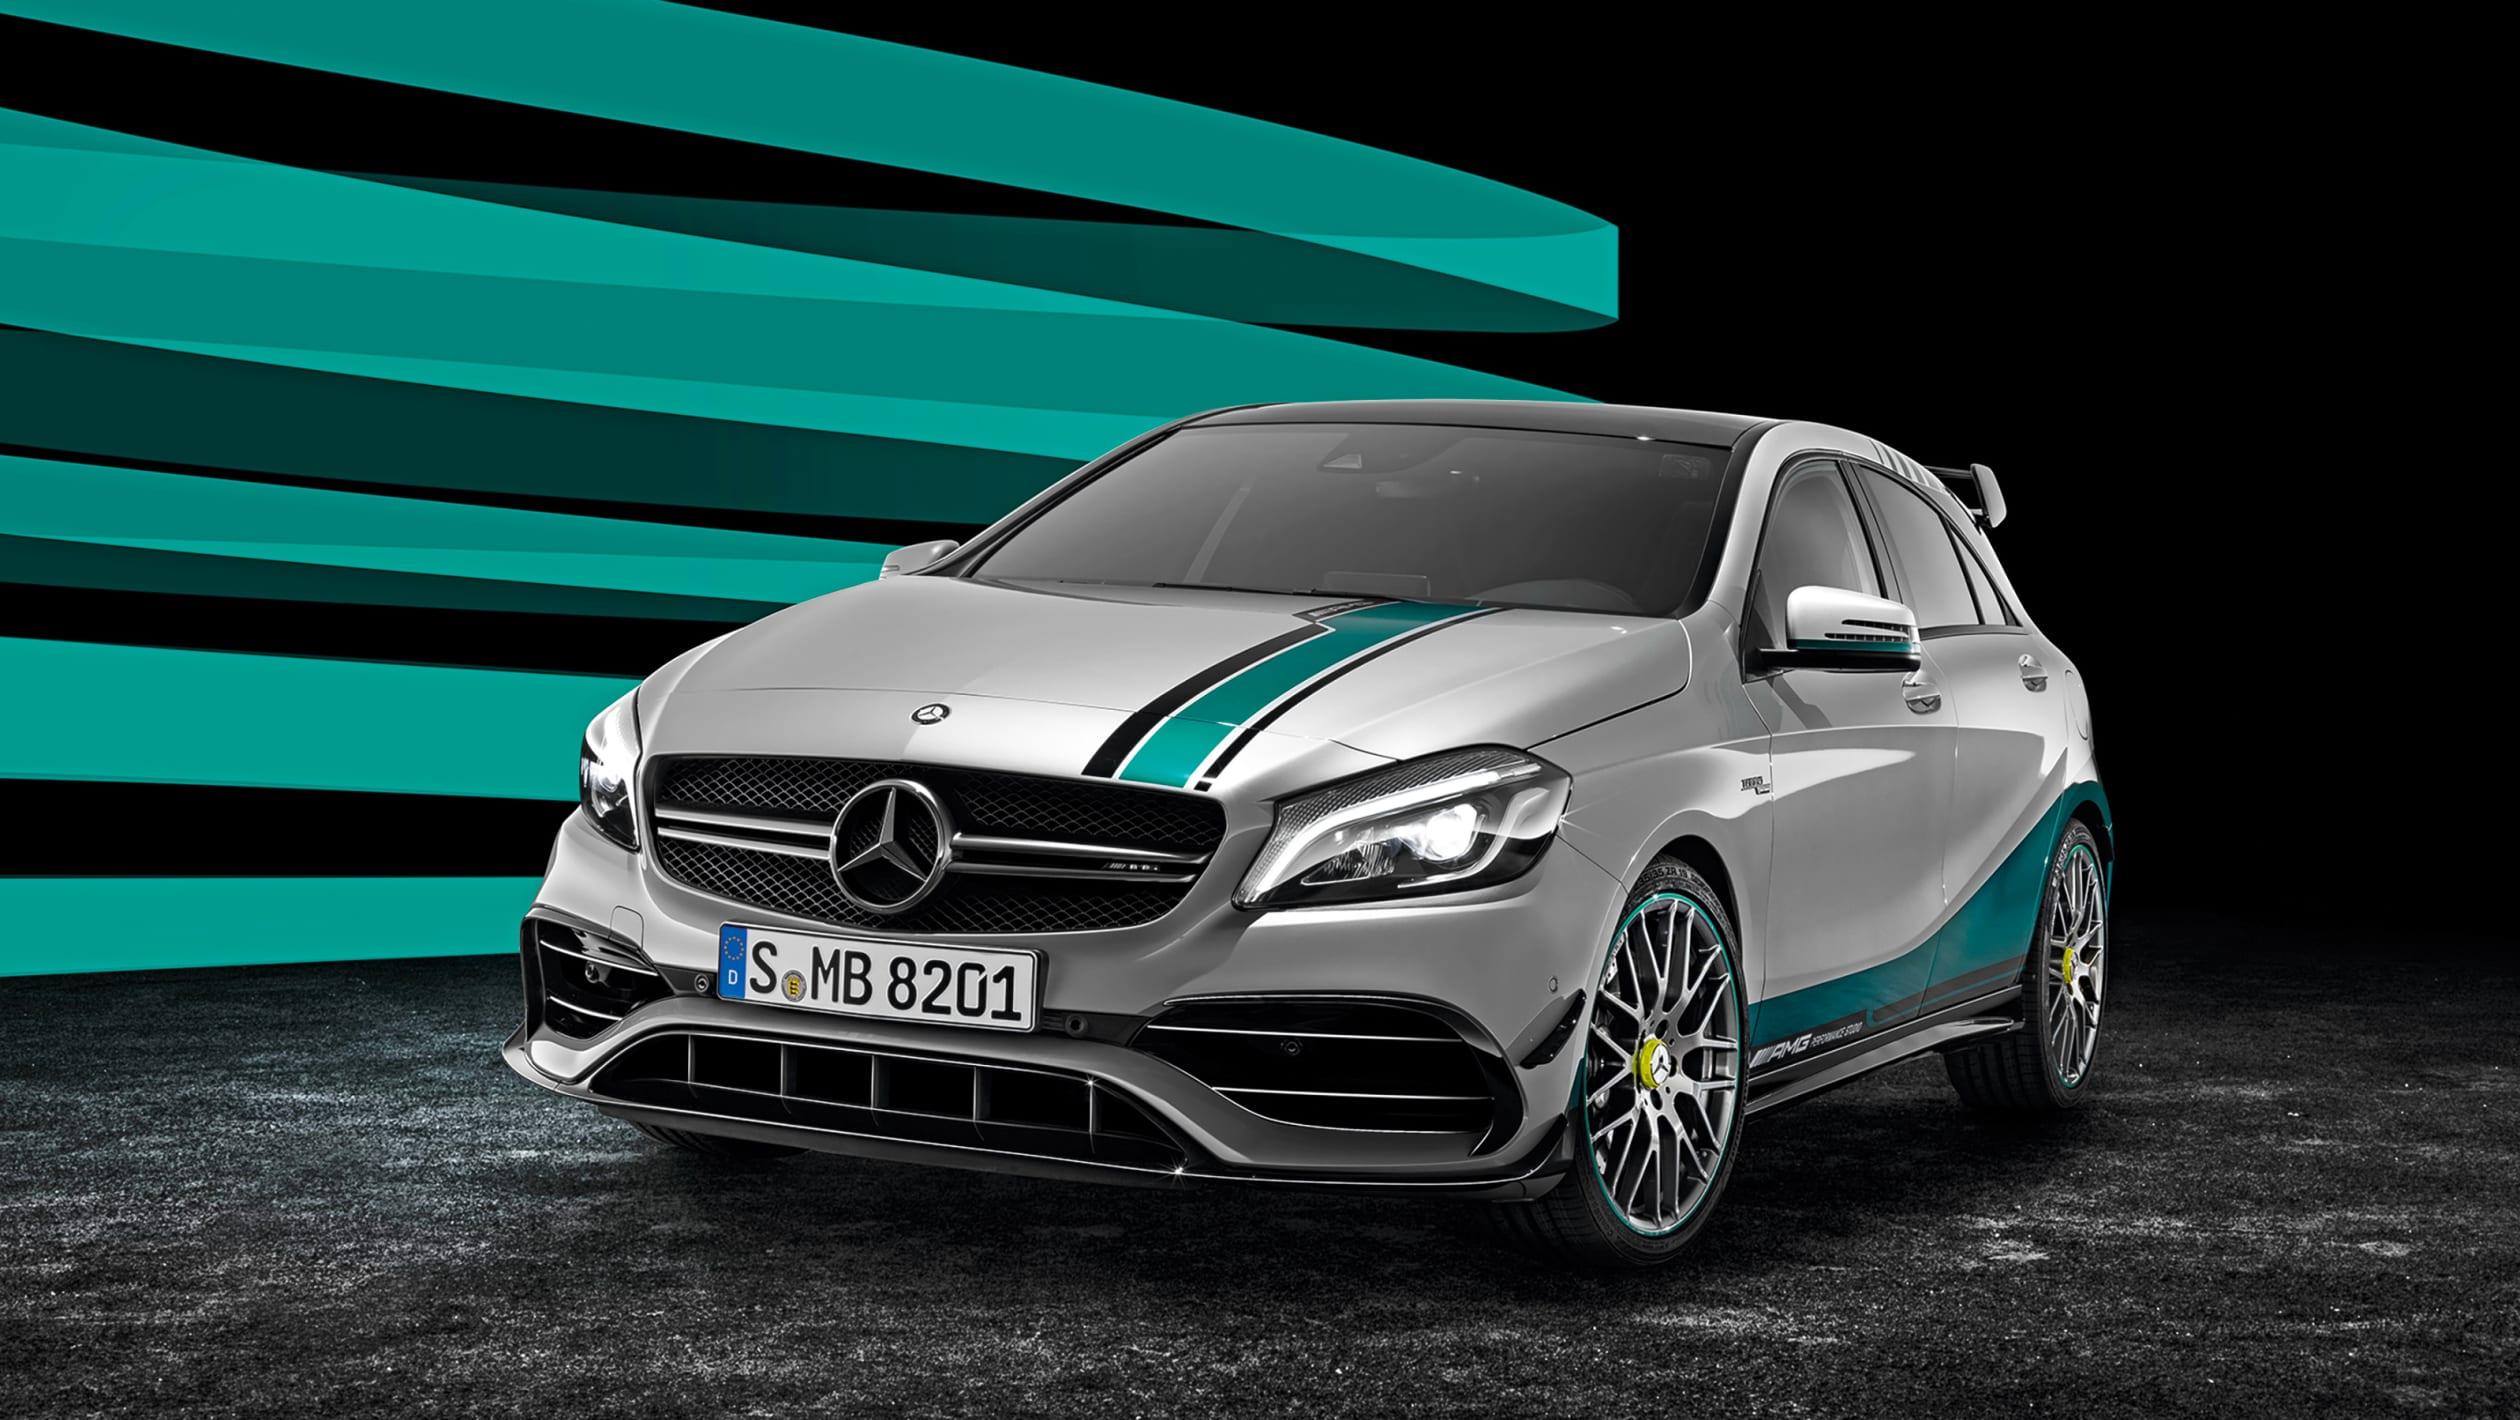 Mercedes A 45 AMG Petronas 2015 WC Edition F1 Road cars